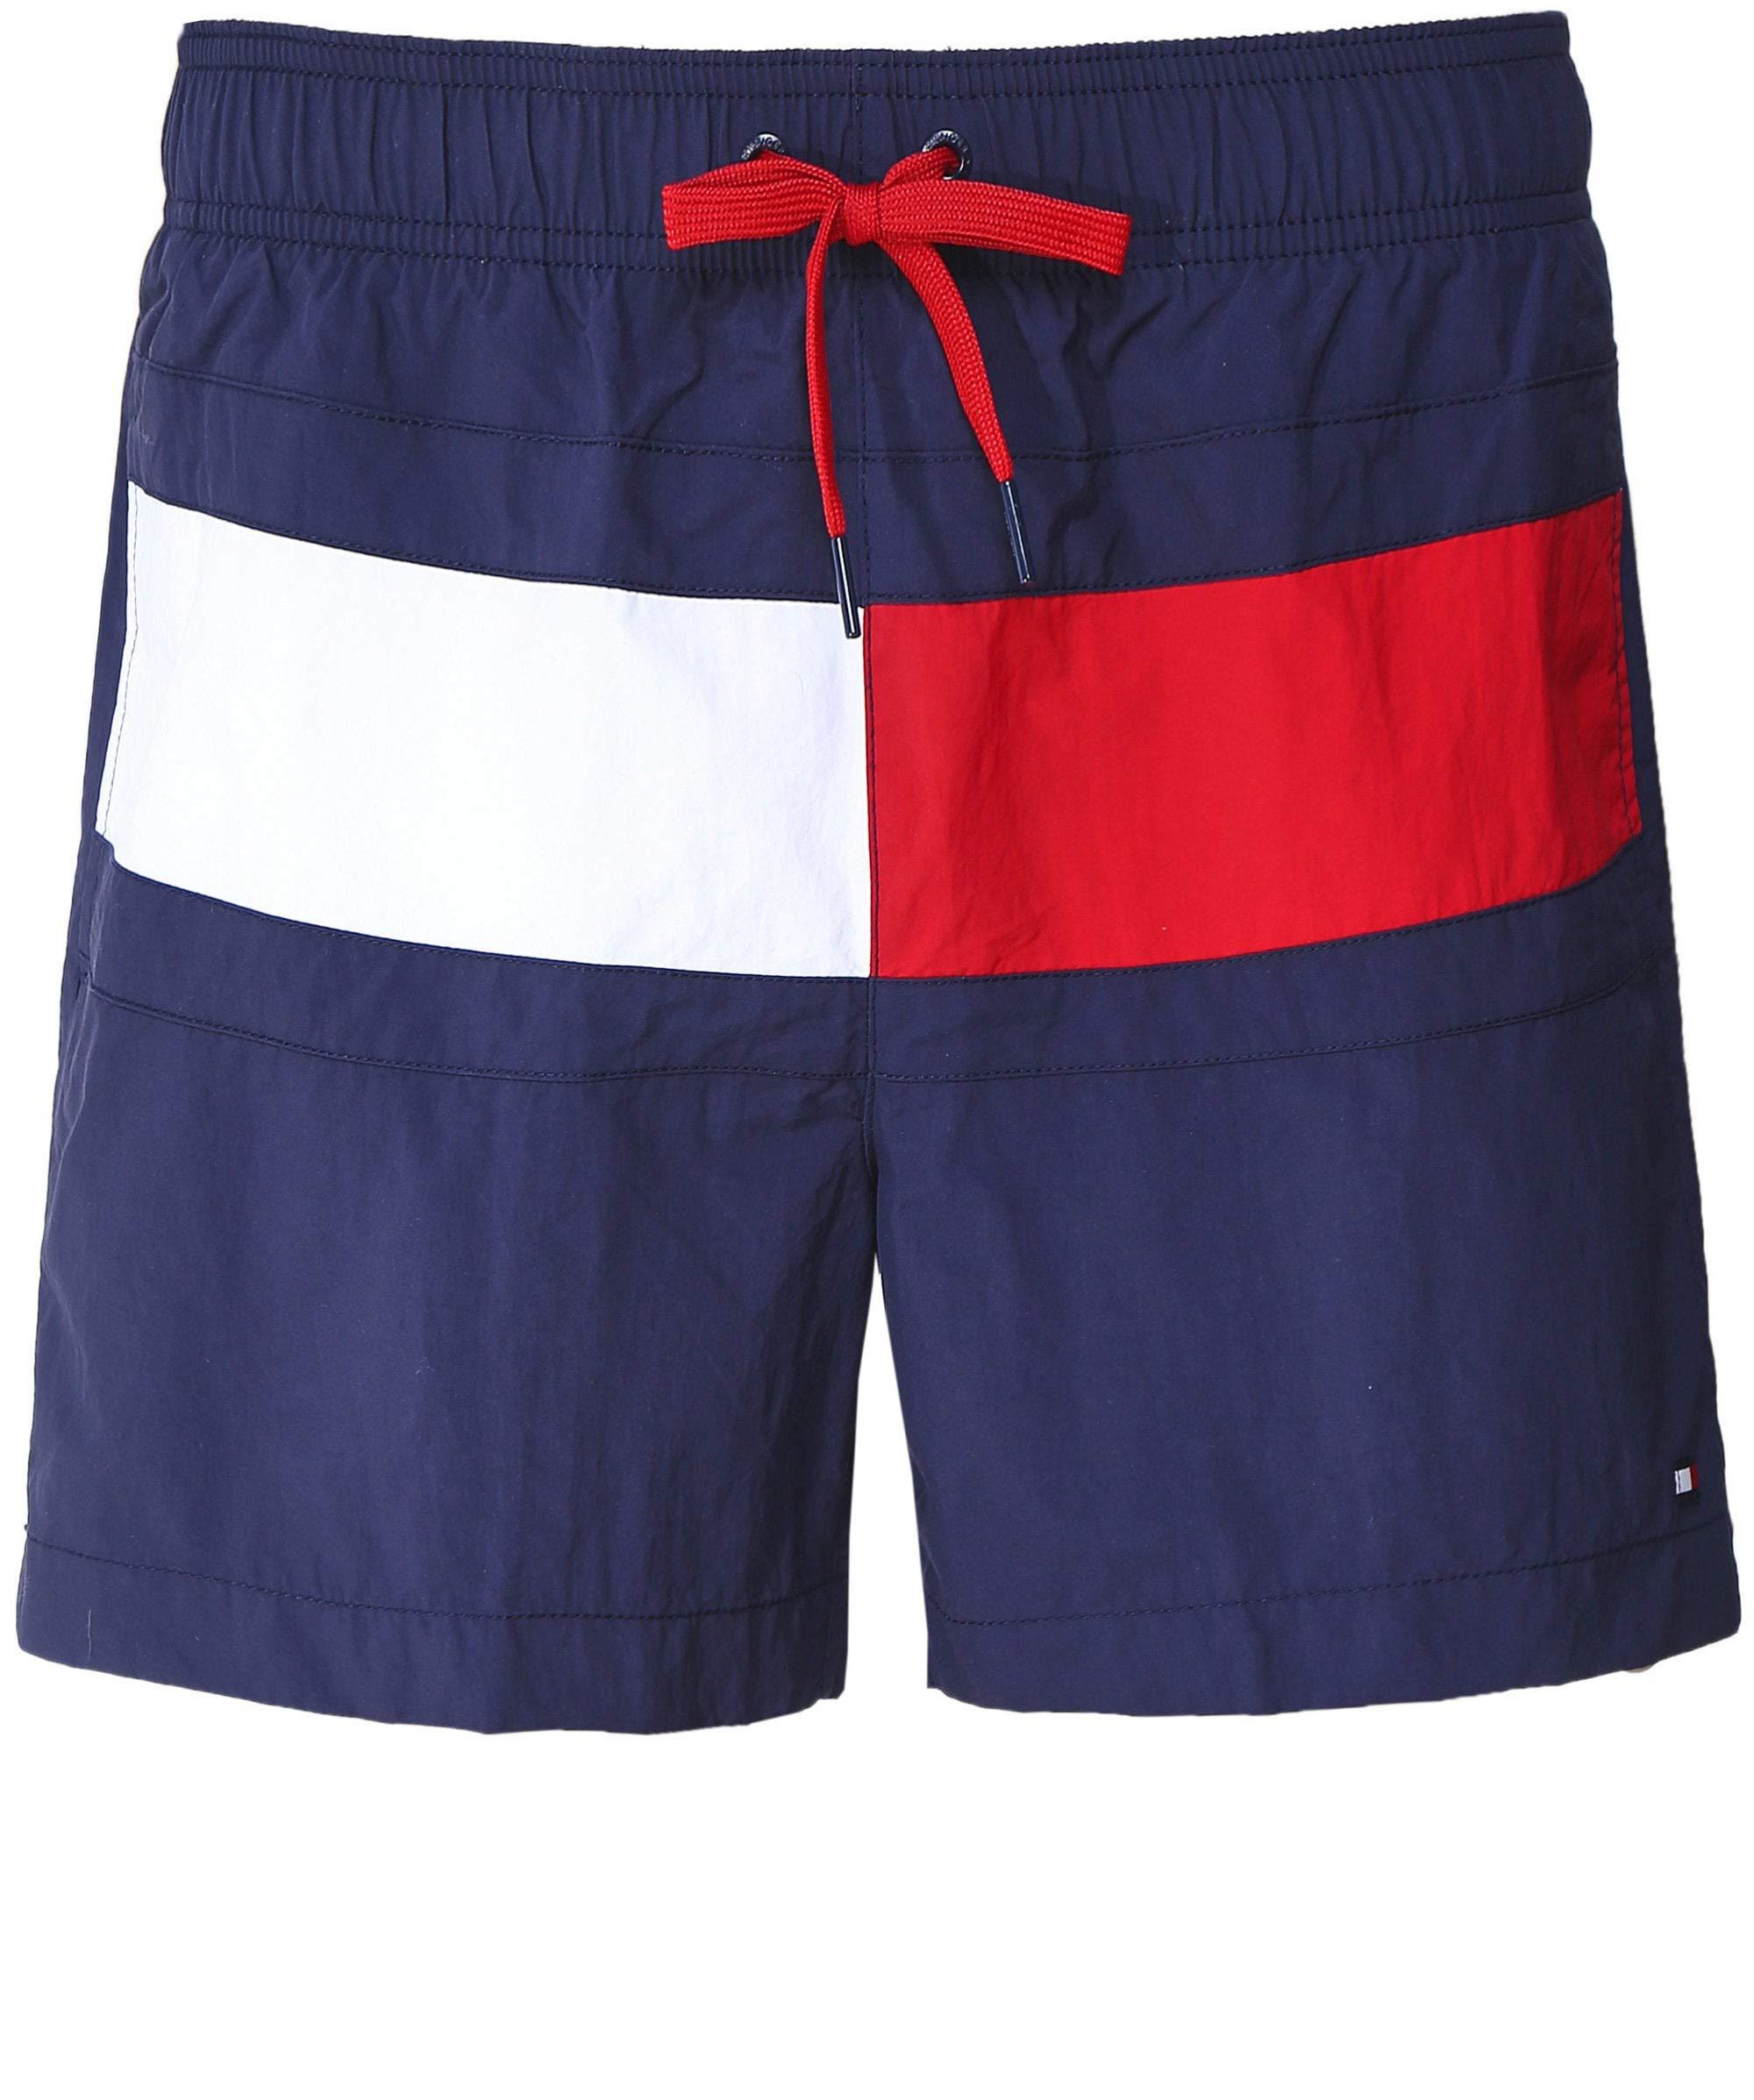 Tommy Hilfiger Medium Drawstring Pantalones Cortos para Hombre